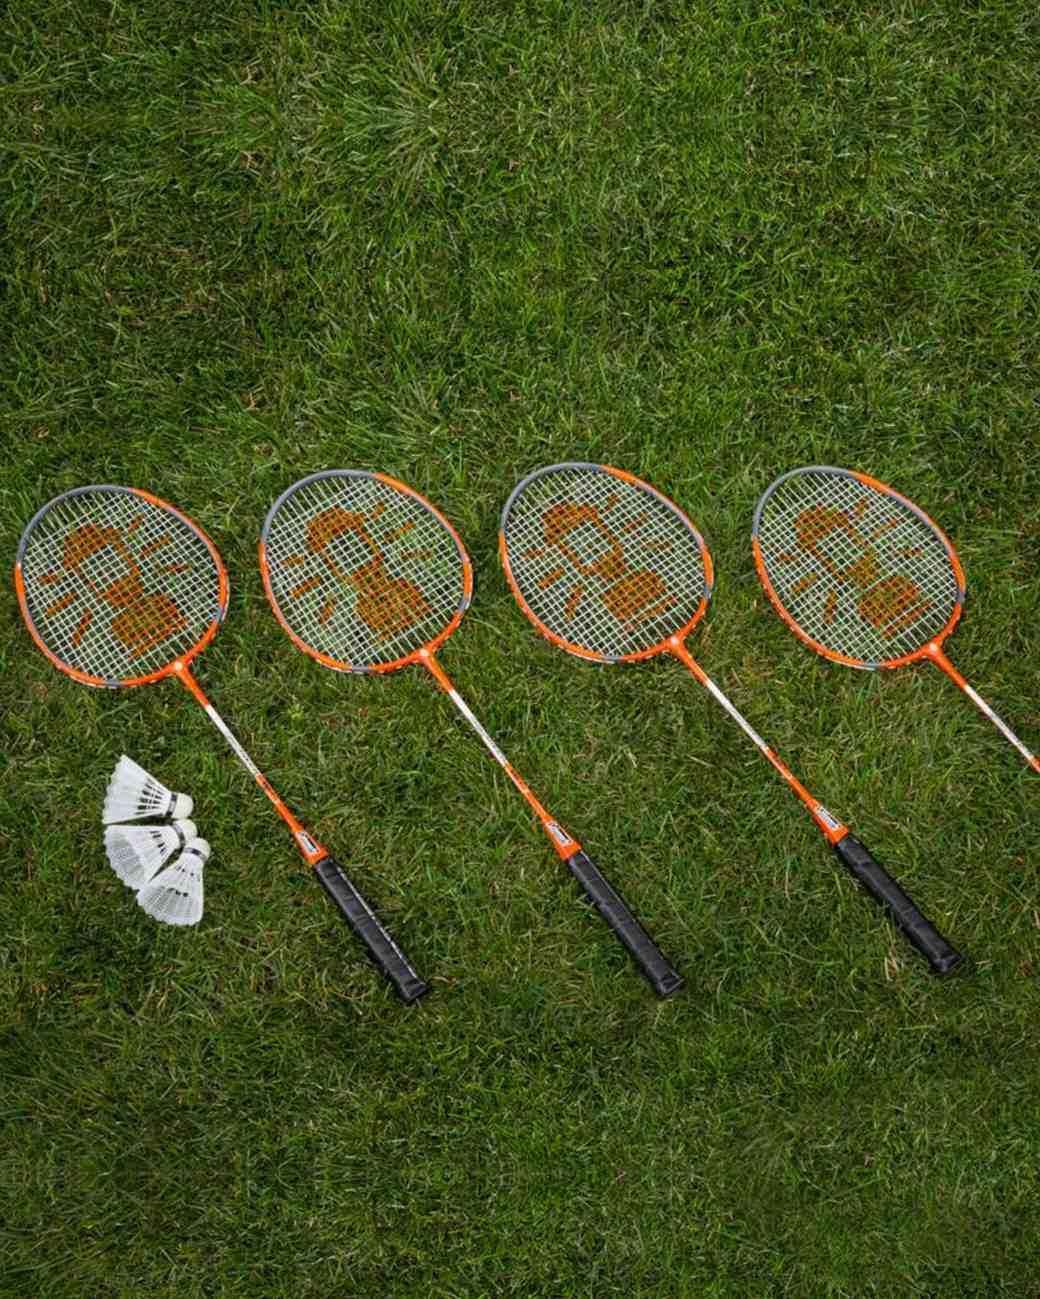 coleman badminton set